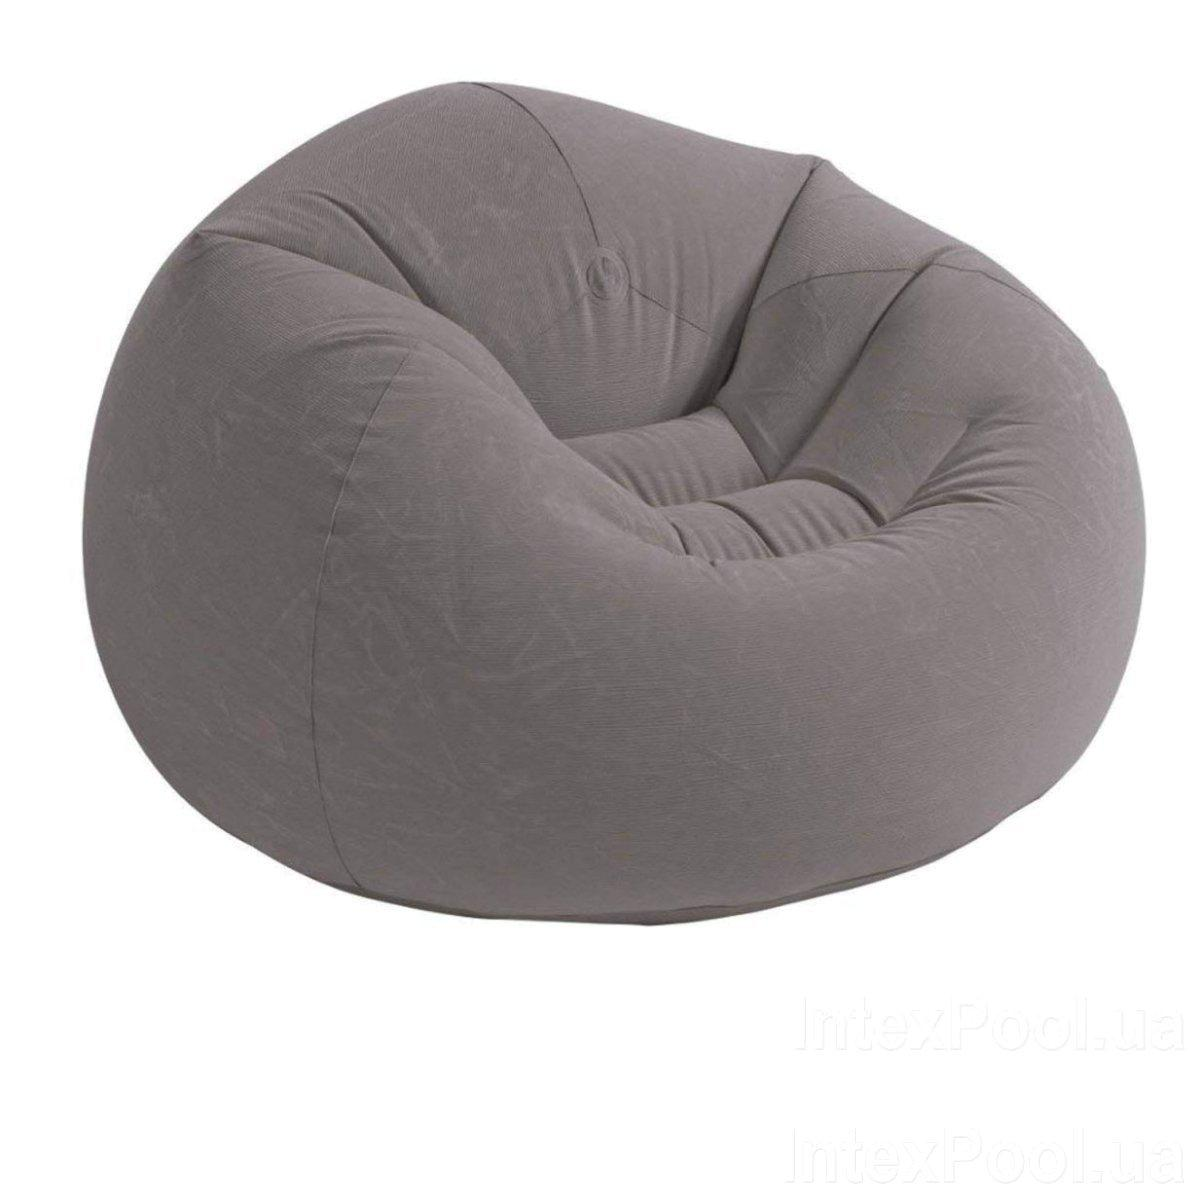 Надувное кресло Intex 68579, 107 х 104 х 69 см